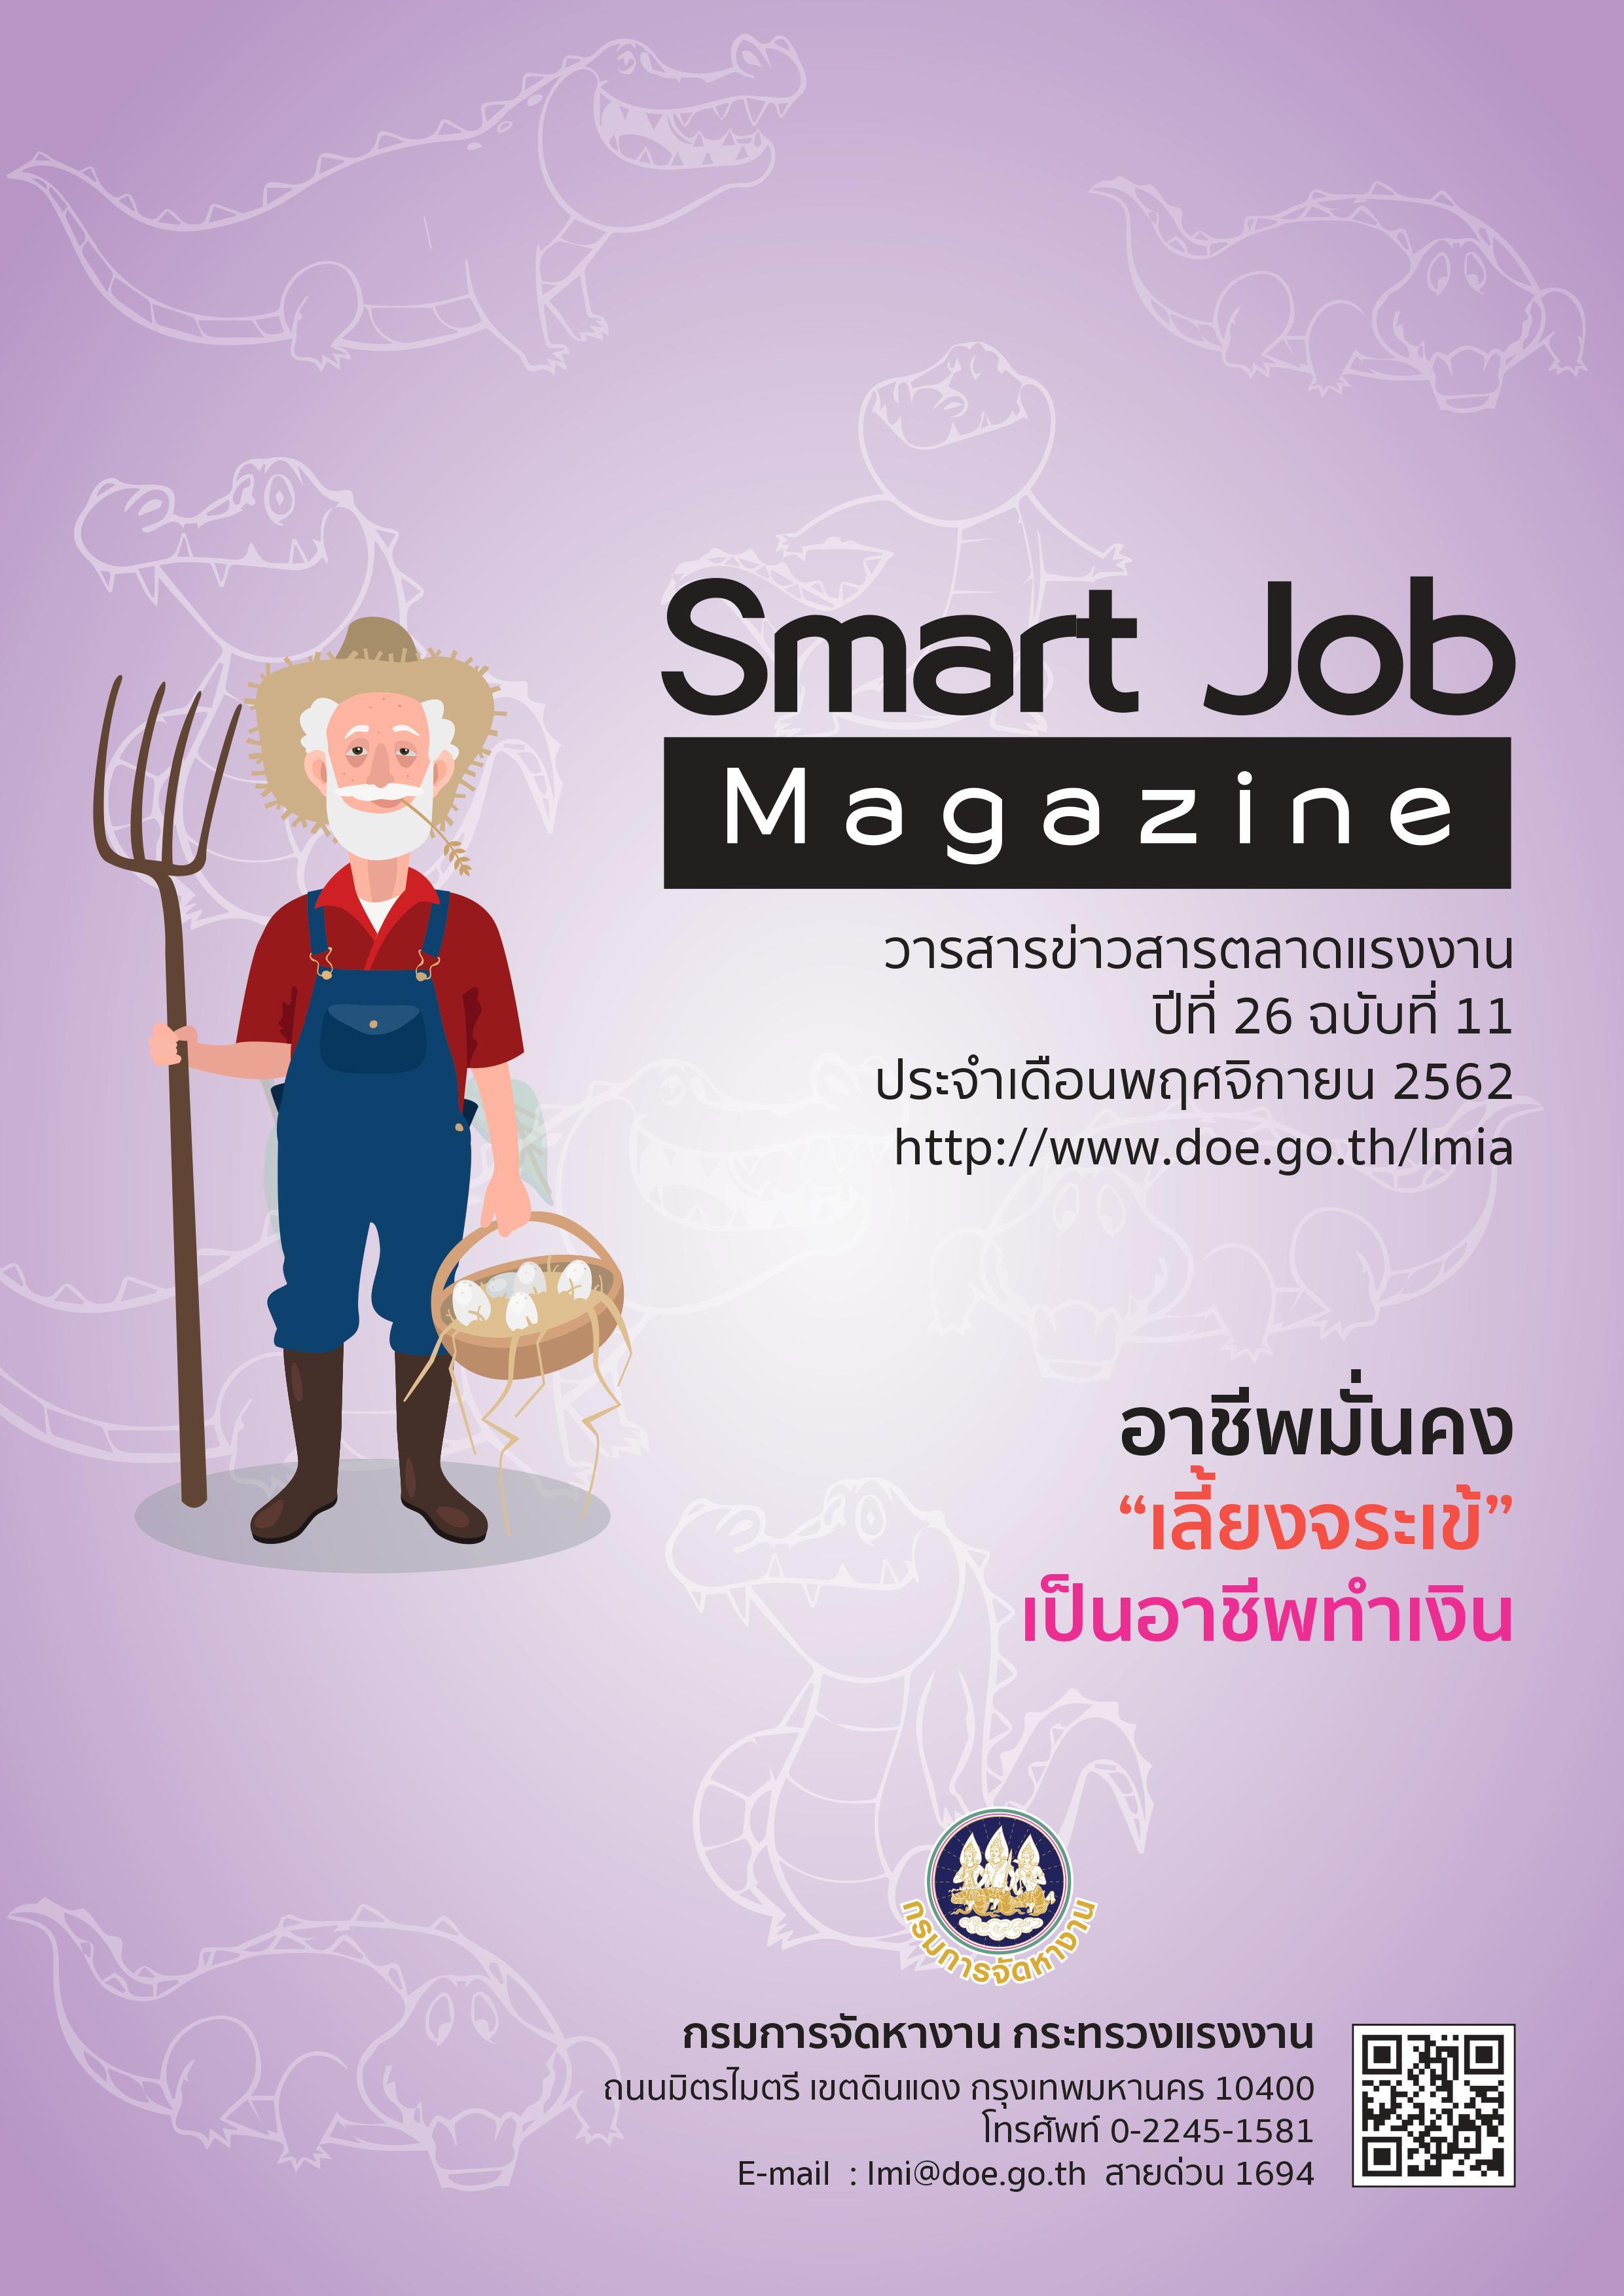 Smart Job Magazine วารสารสถานการณ์ตลาดแรงงาน ปีที่ 26 ฉบับที่ 11 ประจำเดือนพฤศจิกายน 2562